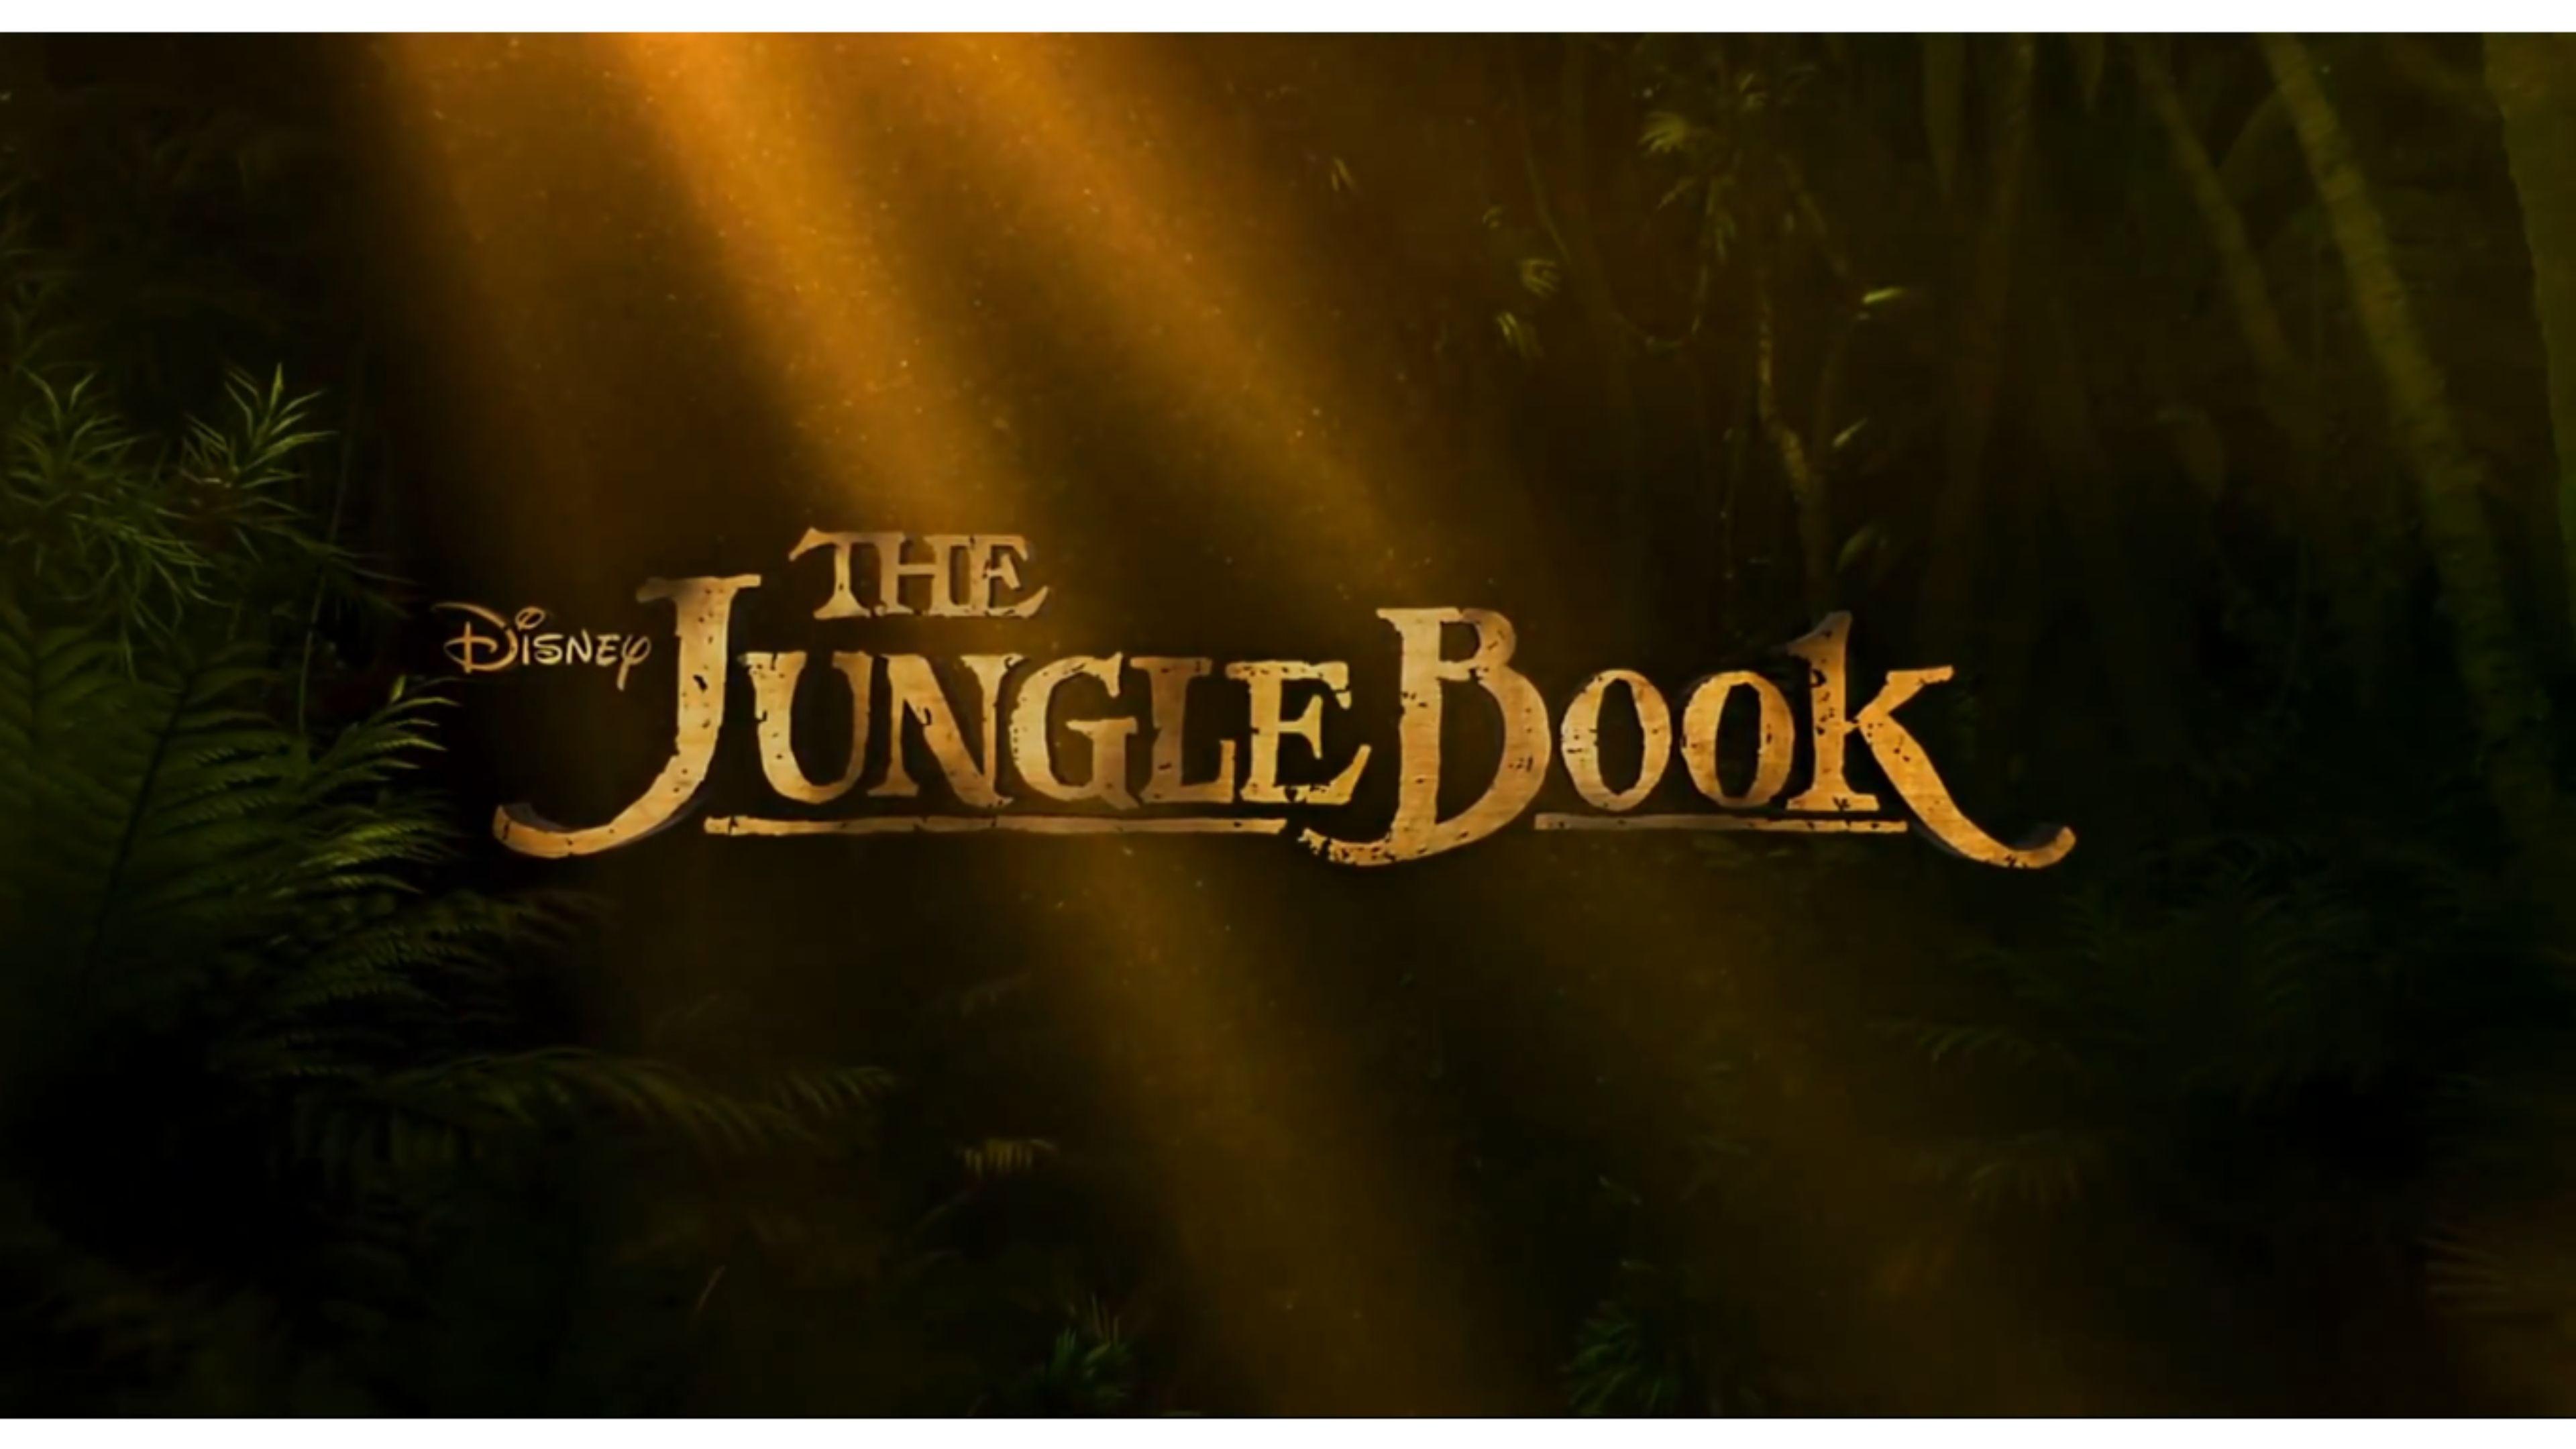 Disney 4K 2016 Jungle Book Movie Wallpapers 4K Wallpaper 3840x2160